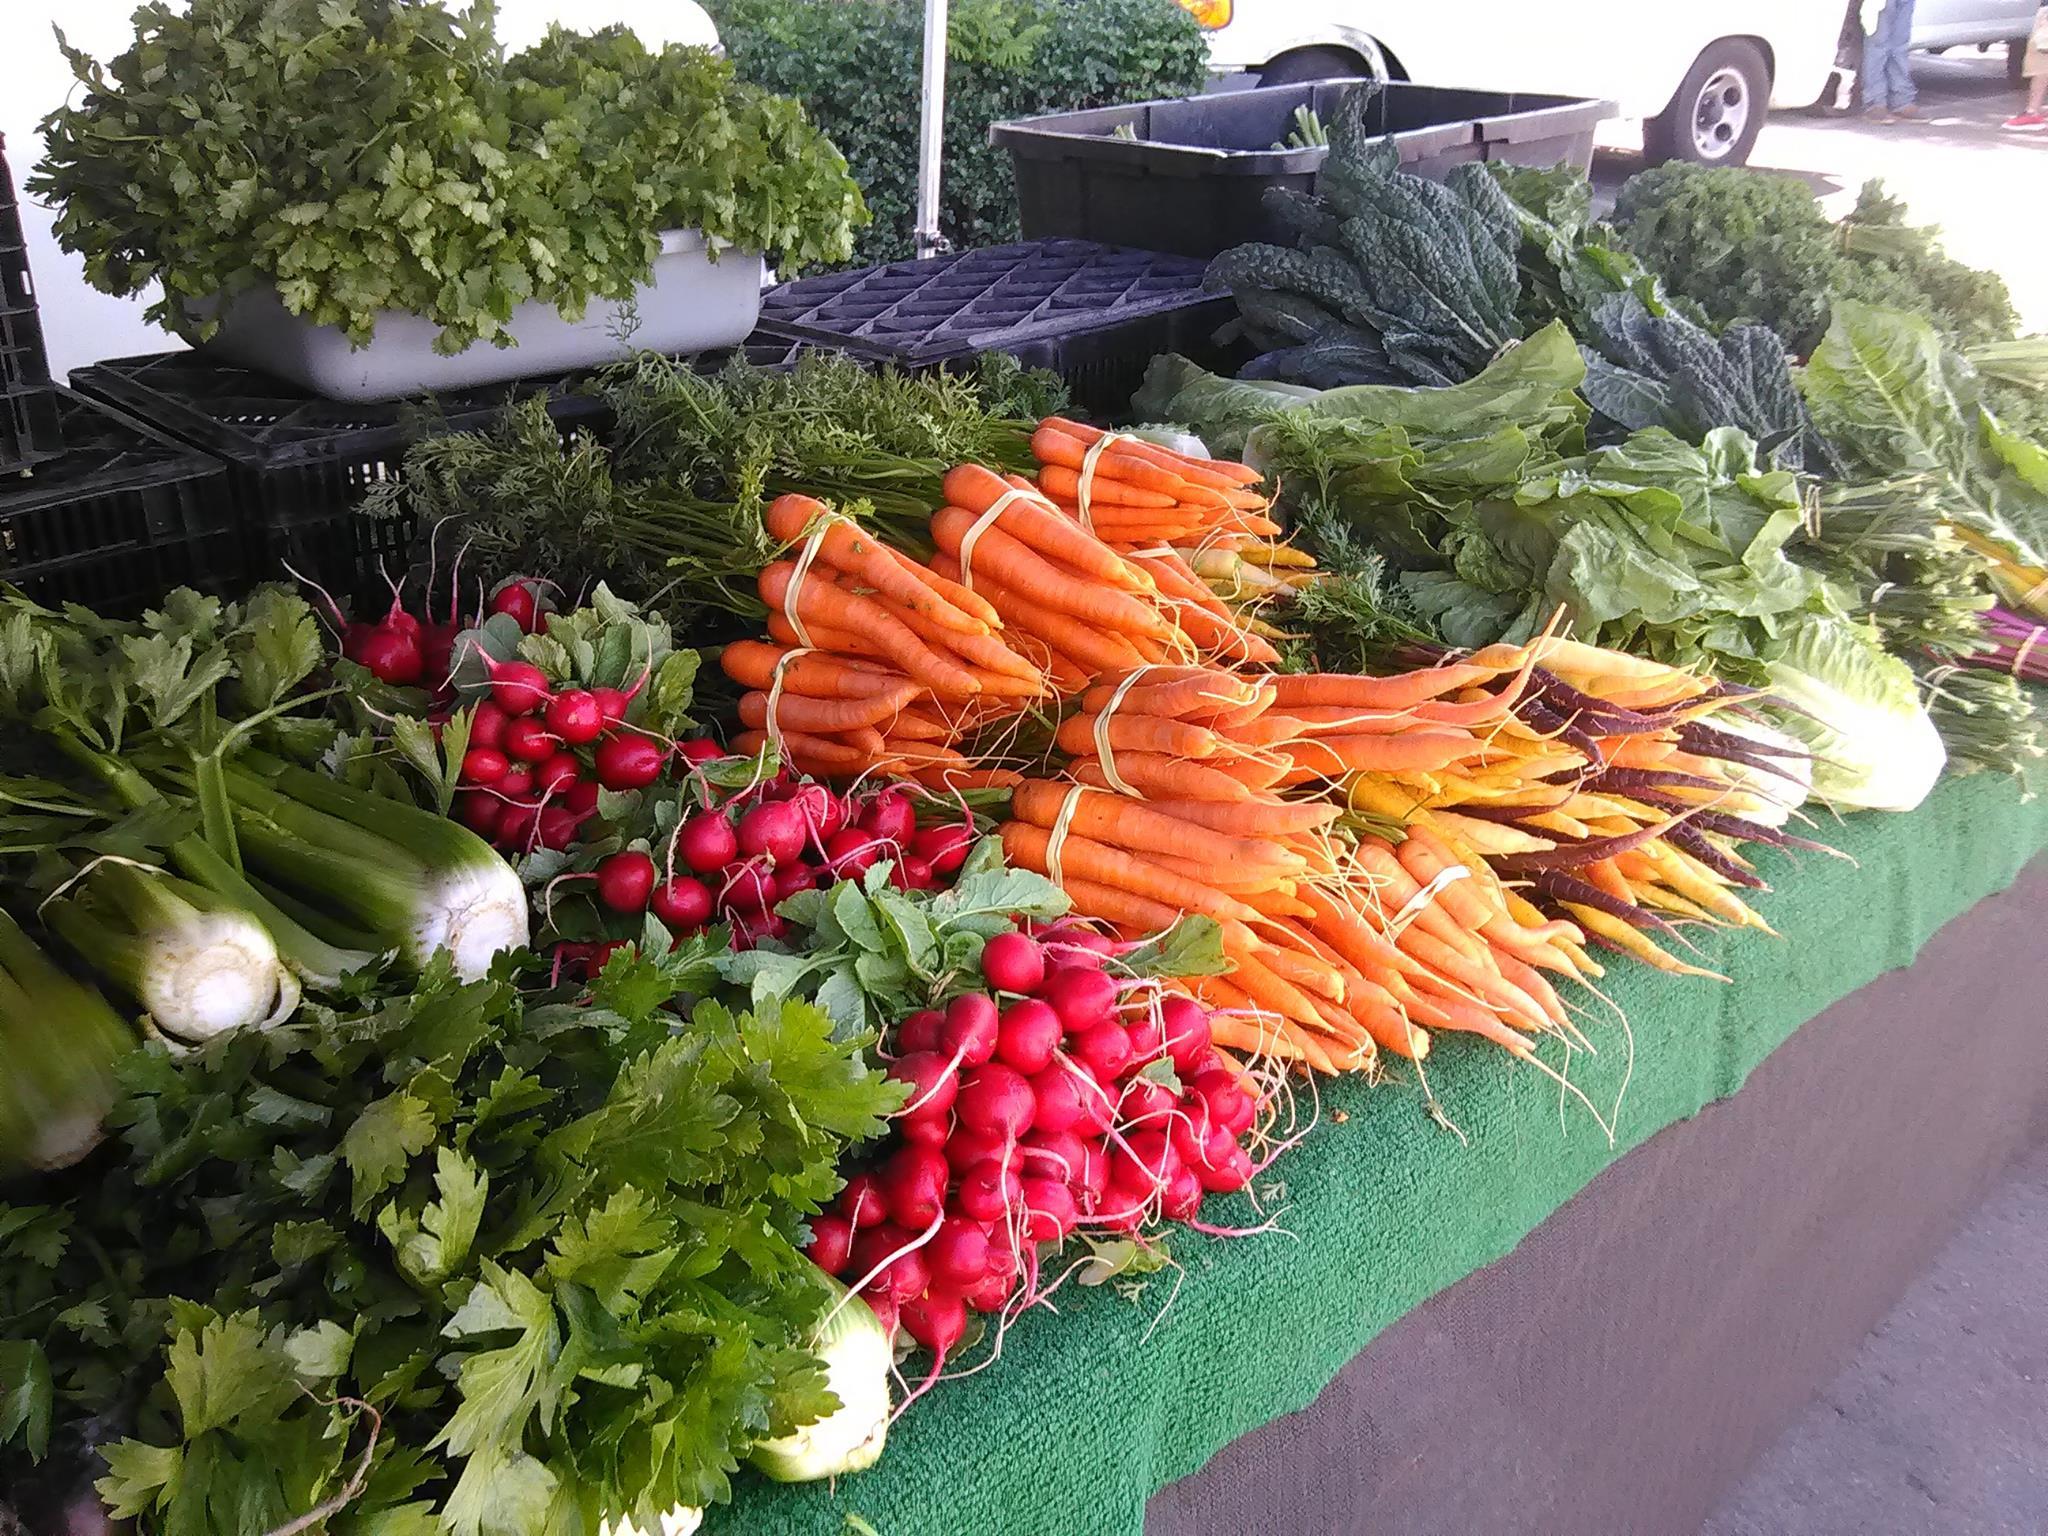 Simi Valley Farmers Market